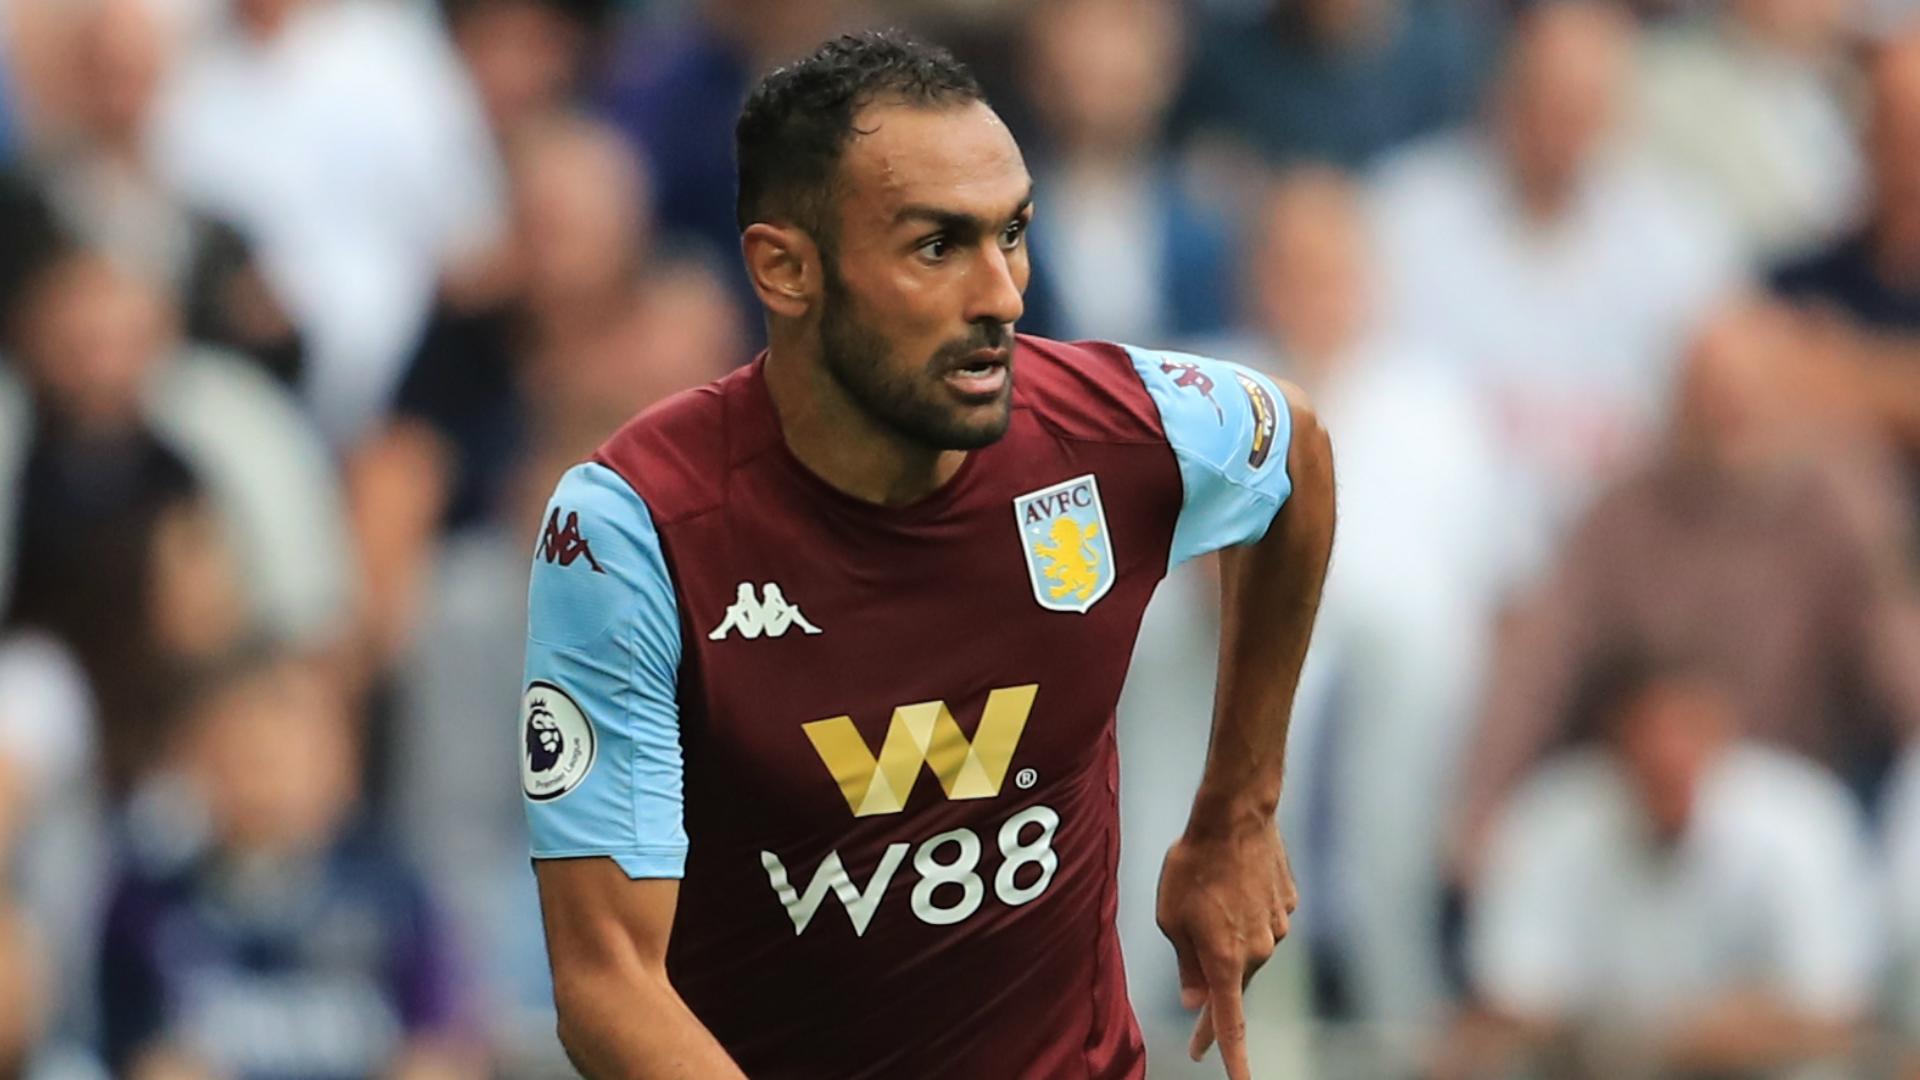 Aston Villa's El Mohamady ends five-year Premier League scoring wait against Newcastle United